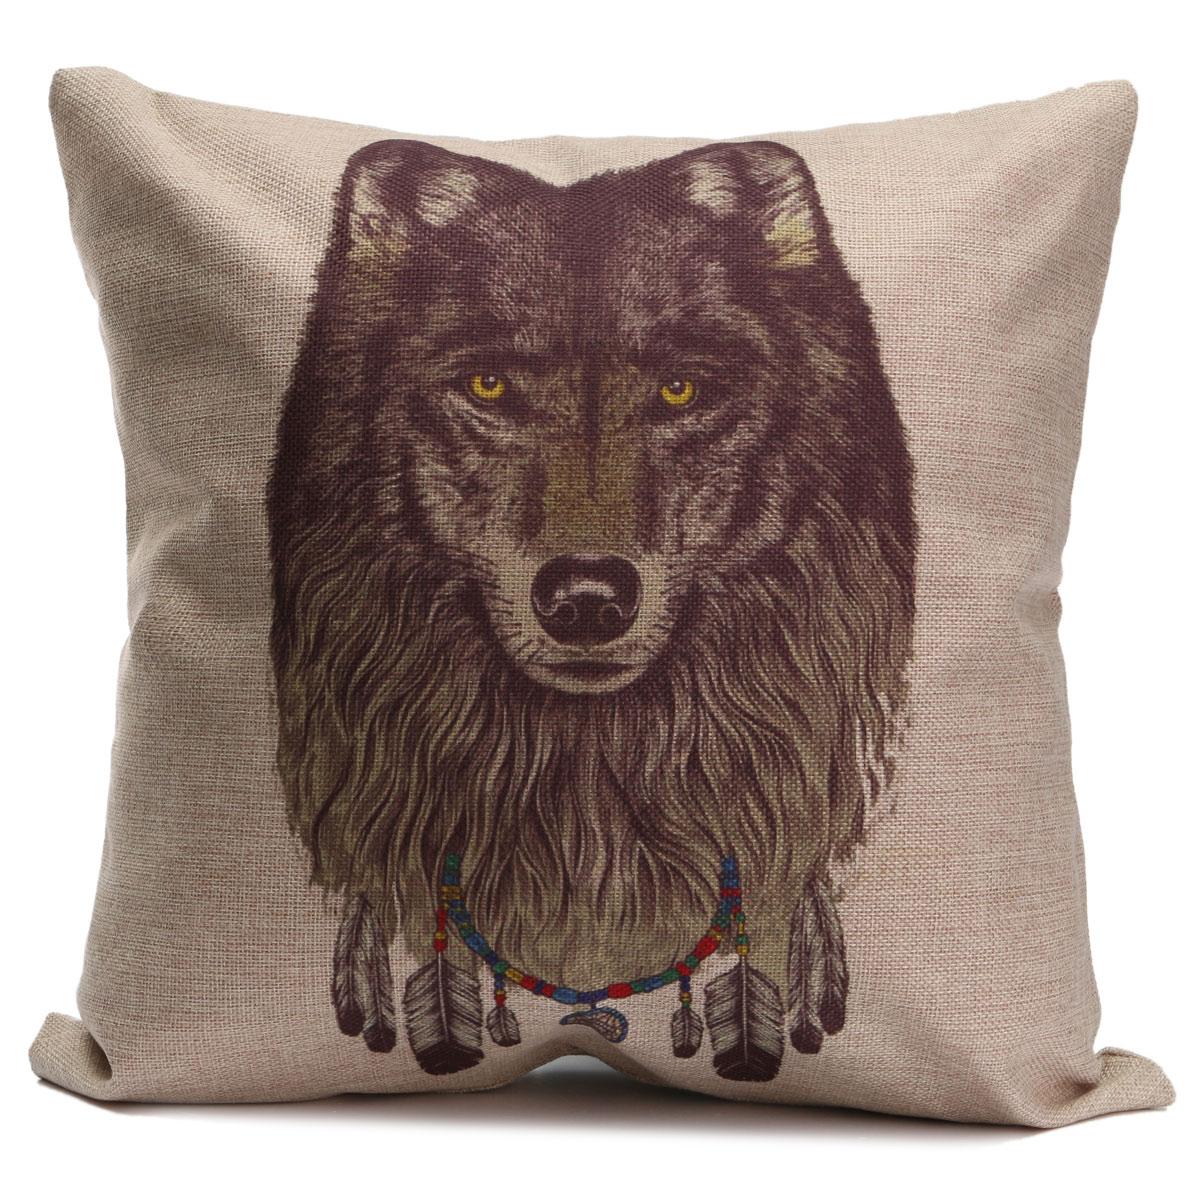 Throw Pillows With Wildlife : Animal World Home Decor Cotton Linen Pillow Case Sofa Waist Throw Cushion Cover eBay